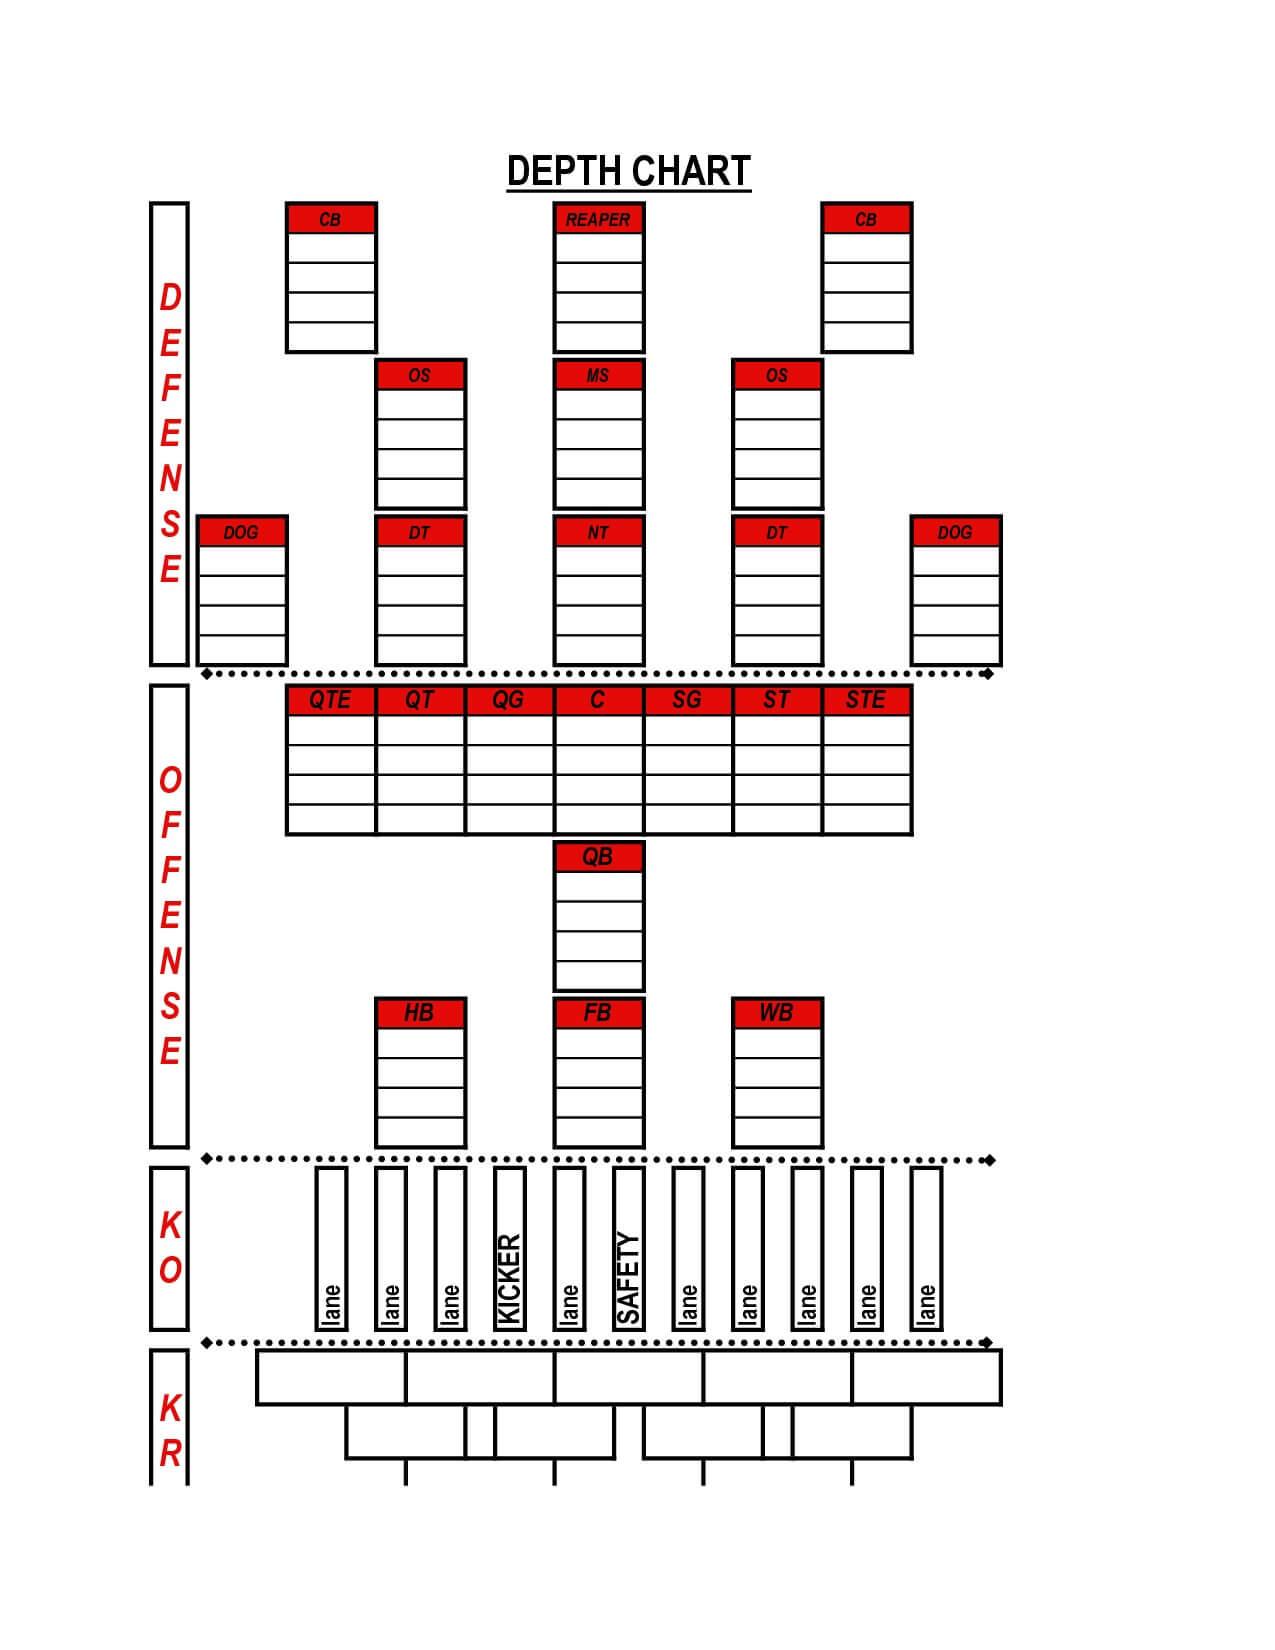 Blank Depth Chart Football - Zohre.horizonconsulting.co Throughout Blank Football Depth Chart Template